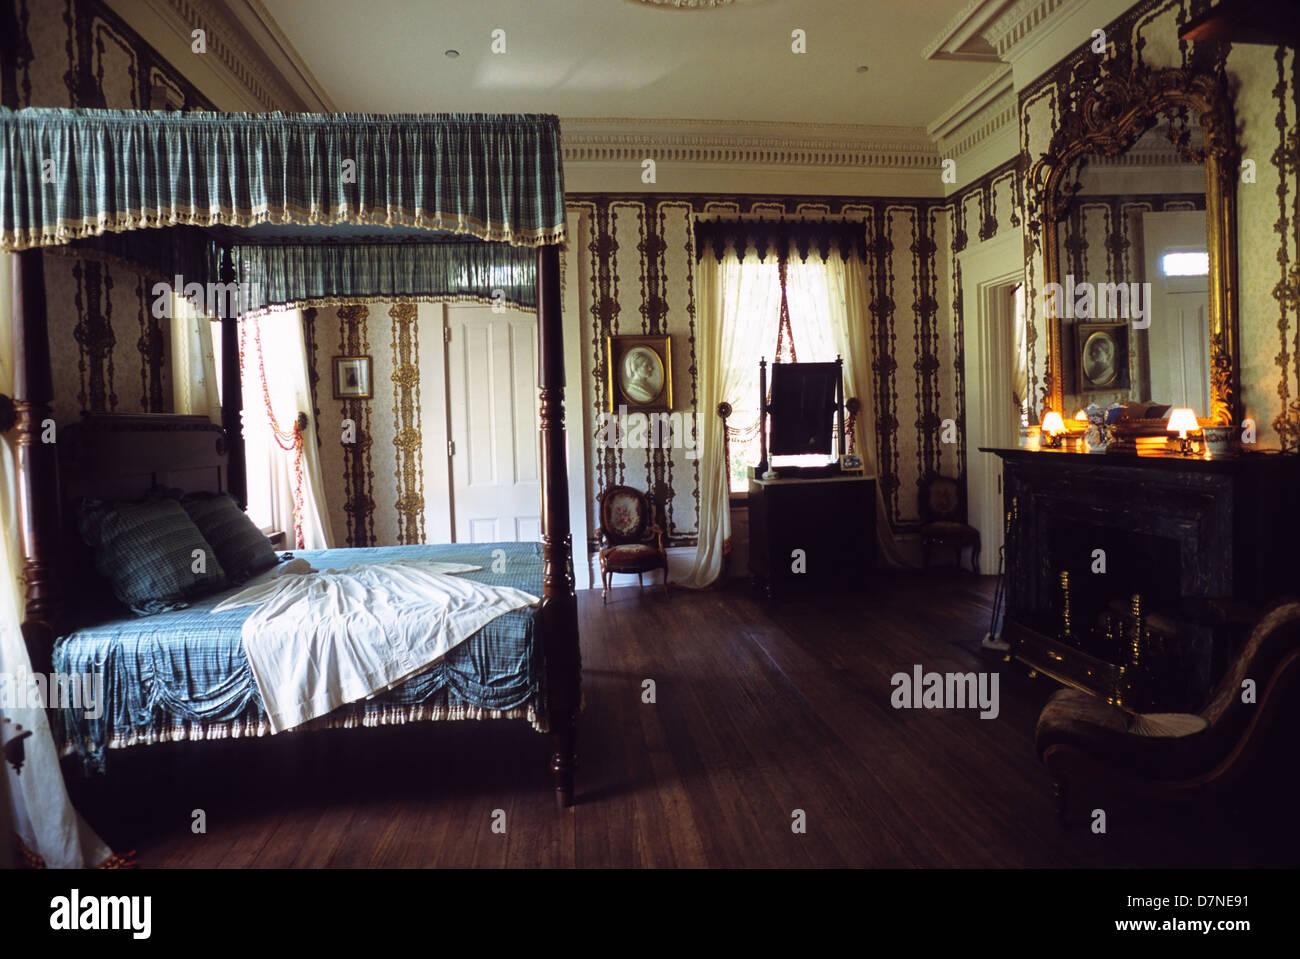 Elk283-3010 Louisiana, St Francisville, Rosedown Plantation State Historic Site, Mansion, 1836, bedroom - Stock Image